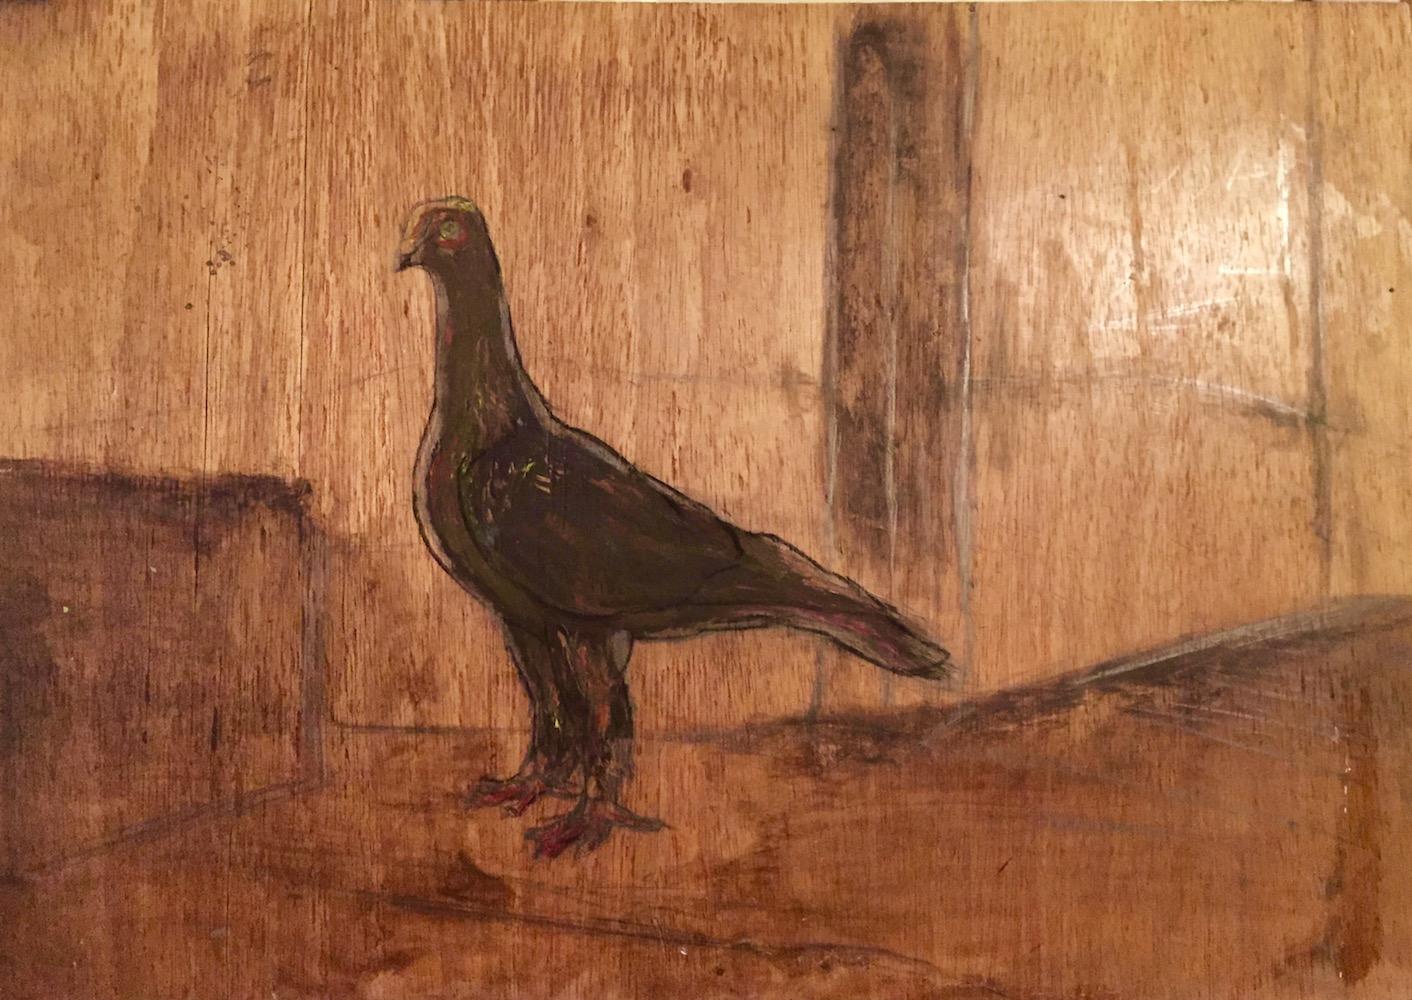 1980-te, Holub, kombinovaná technika na dreve, 48x68 cm